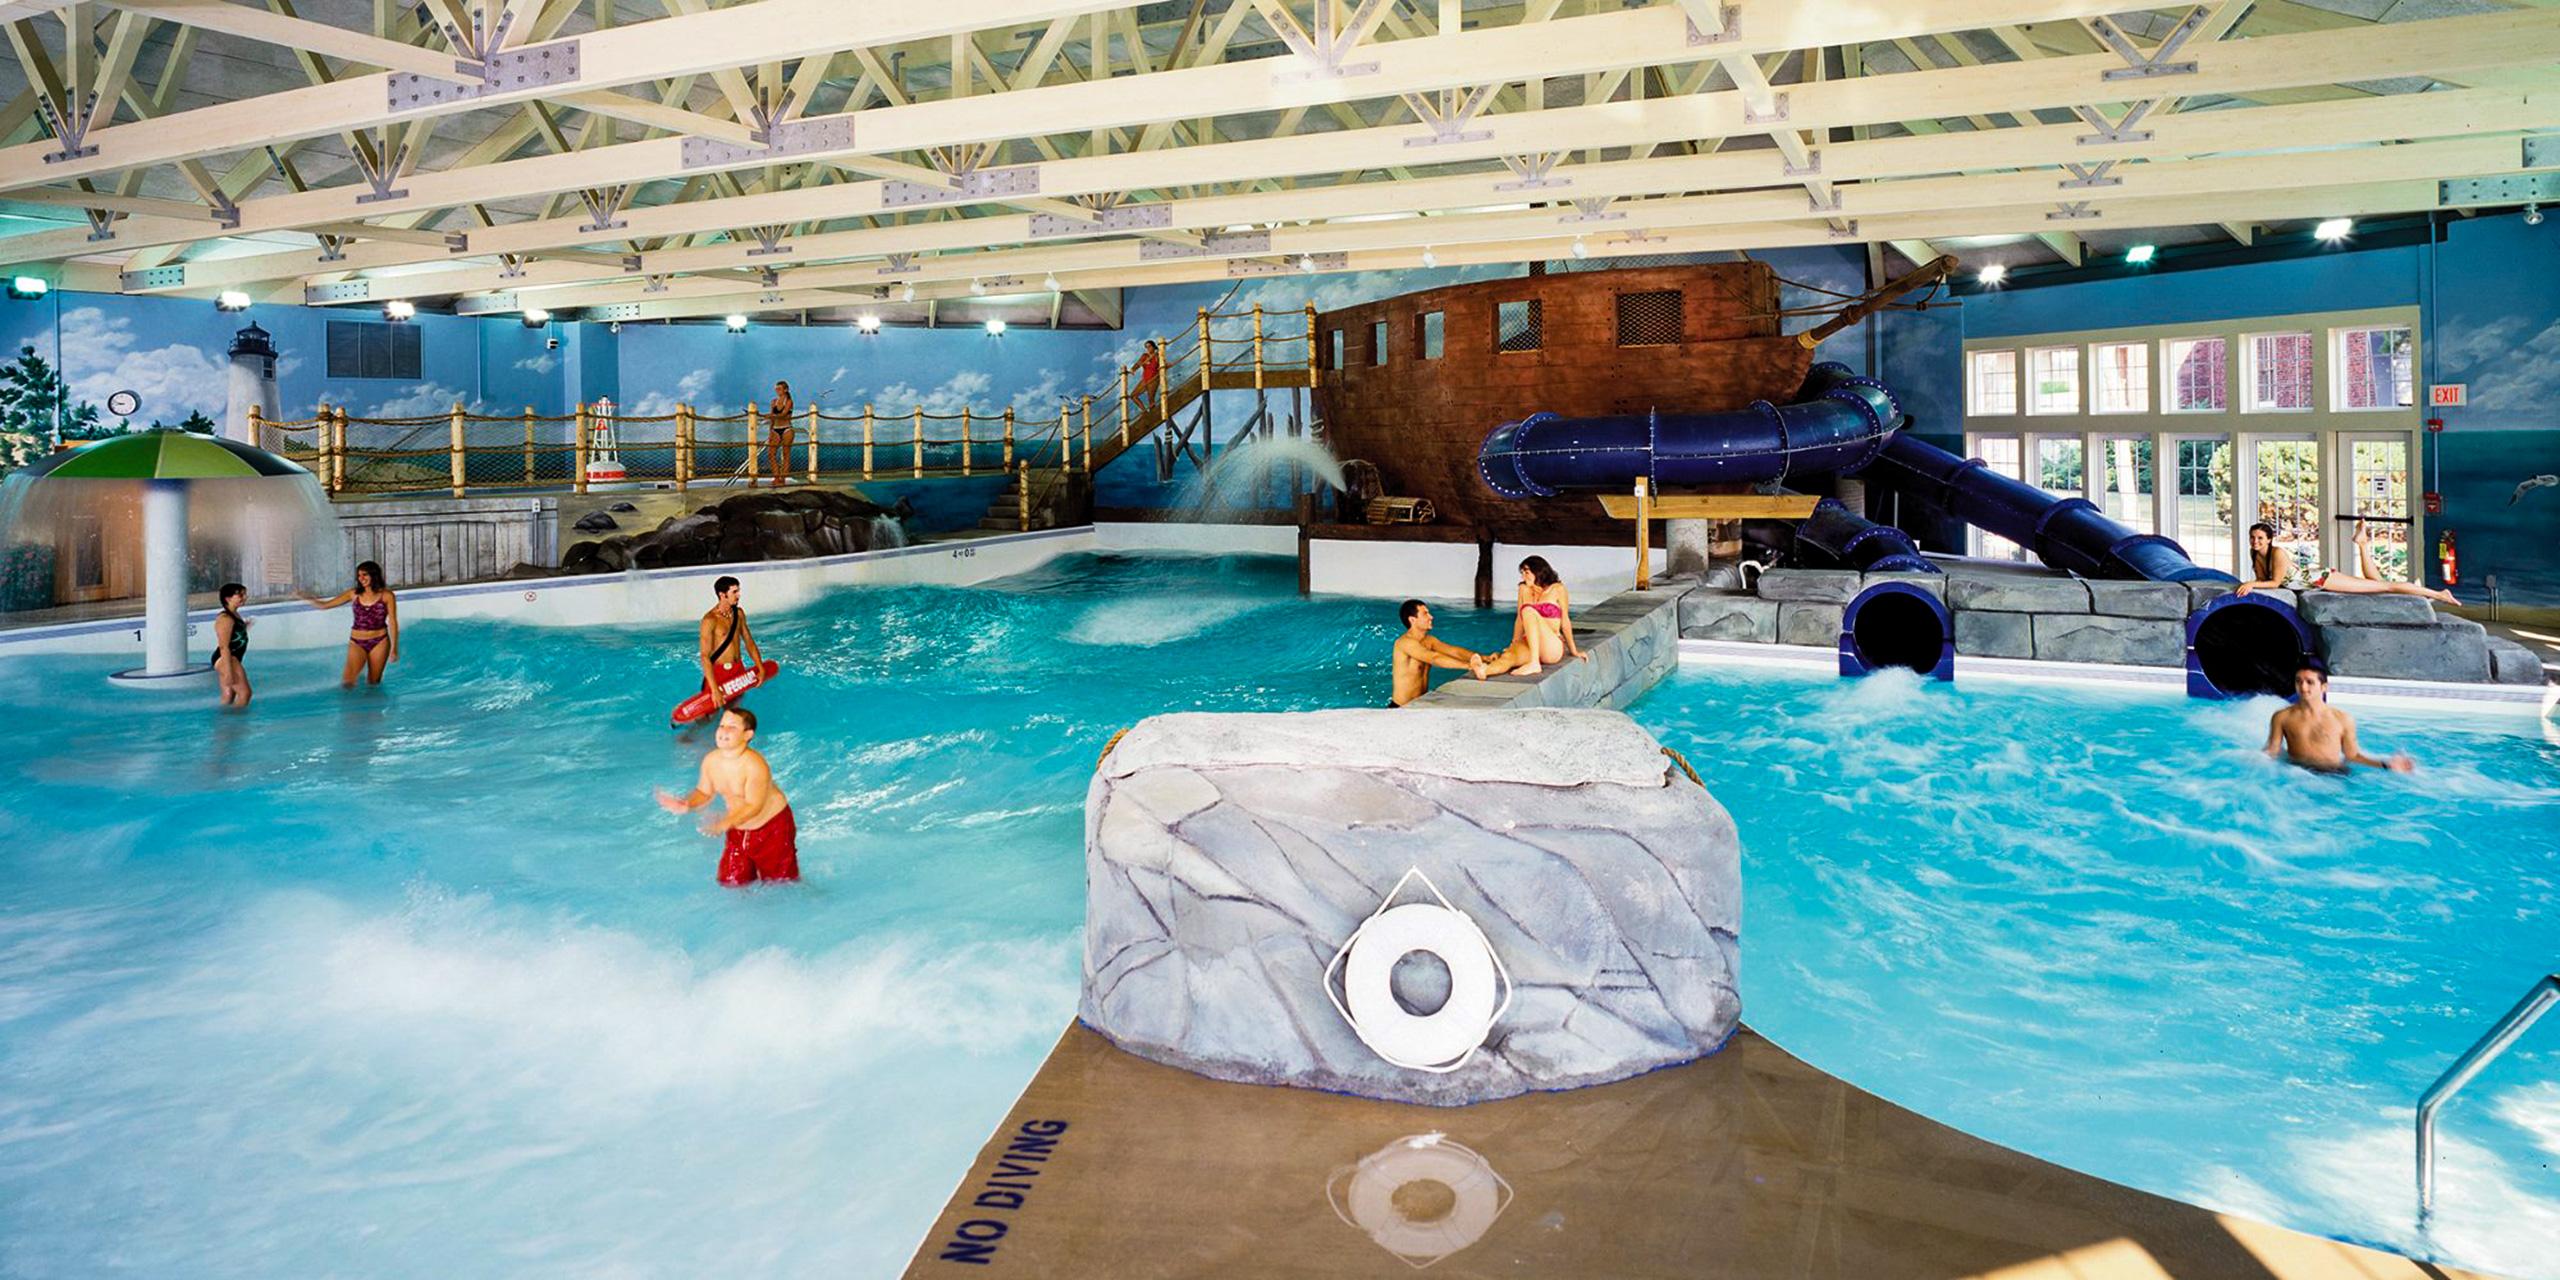 Cape Codder Water Park, Cape Codder Resort & Spa; Courtesy of Cape Codder Water Park, Cape Codder Resort & Spa